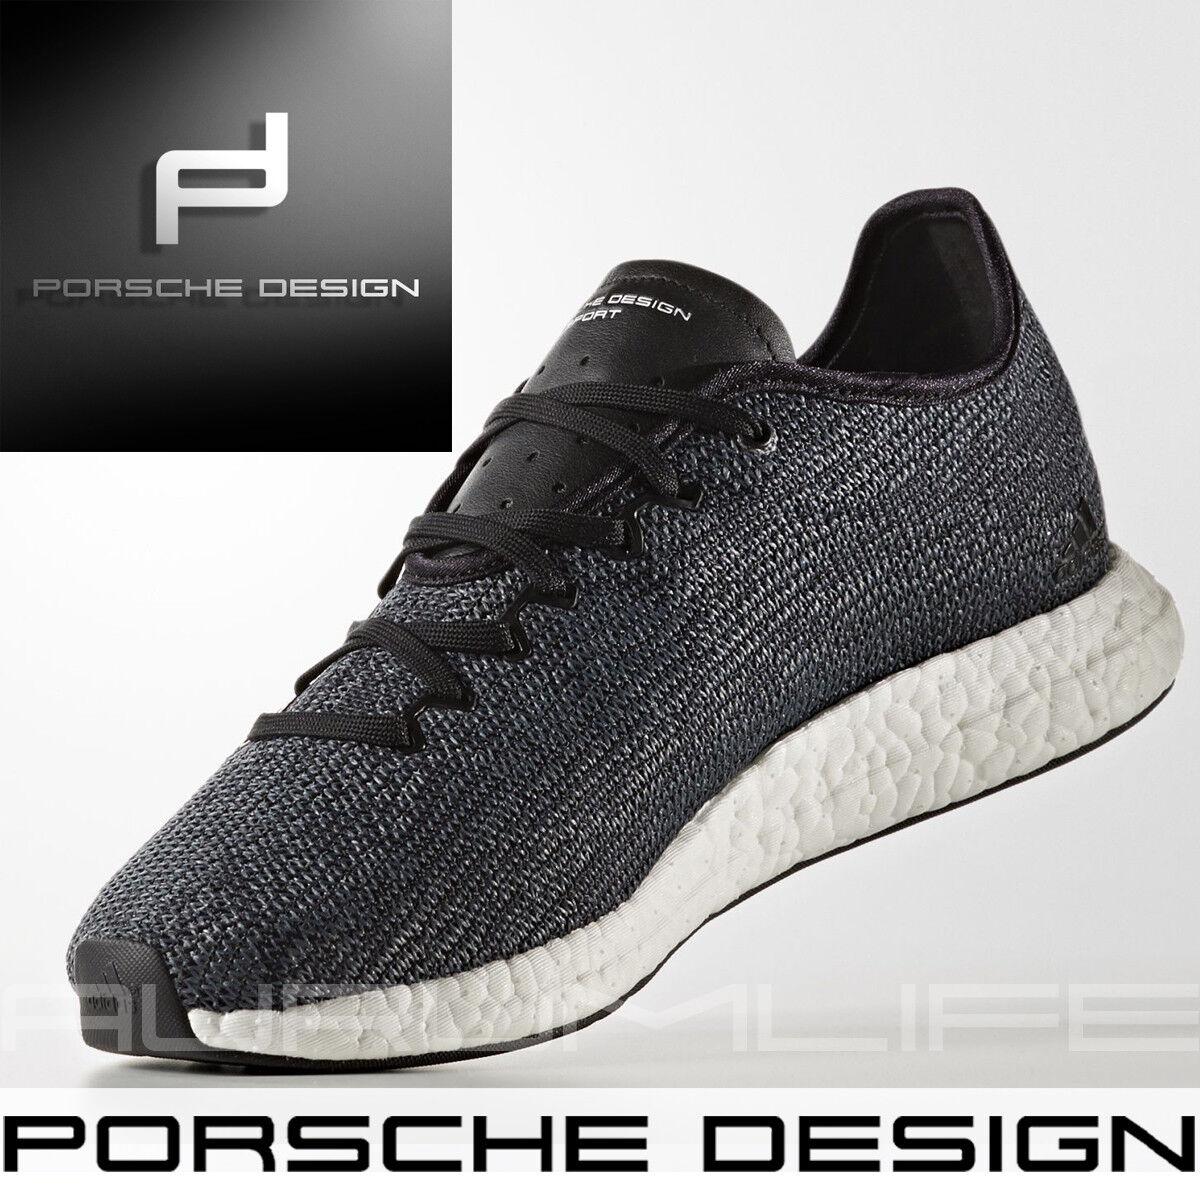 ADIDAS Porsche Design DA VIAGGIO TOURER Boost Scarpe Bounce da uomo in pelle BB5540